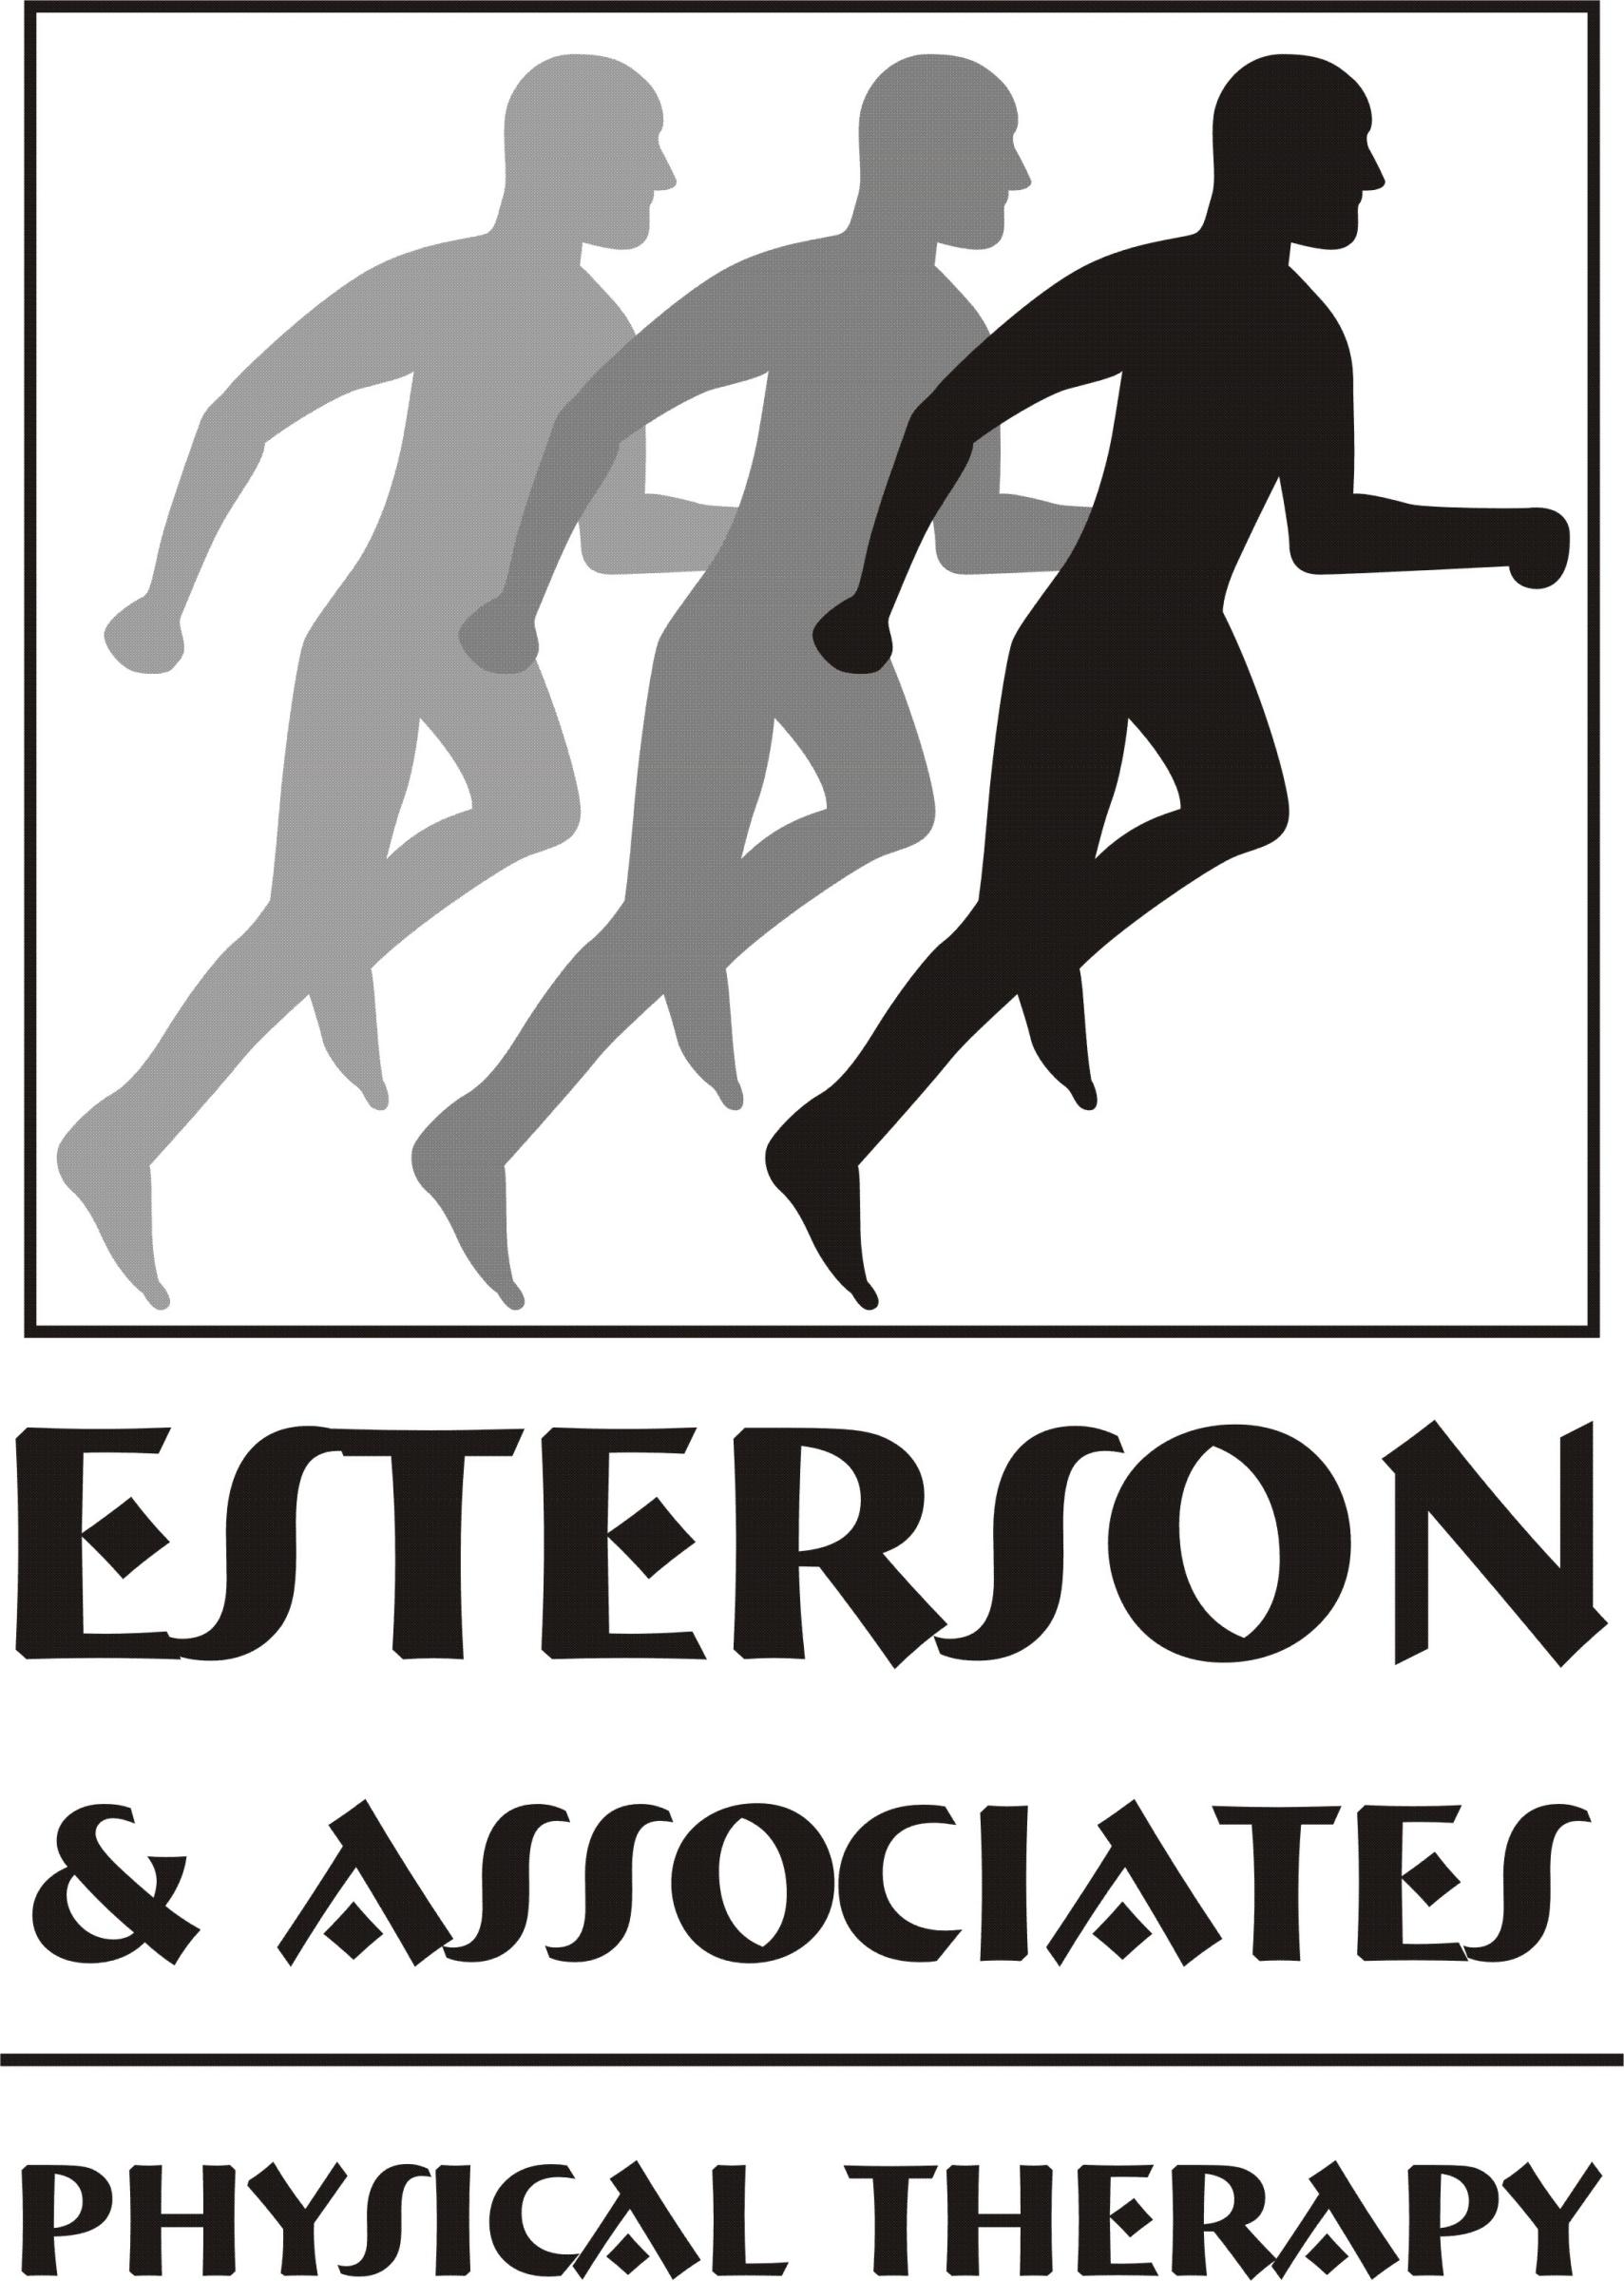 Esterson & Associates